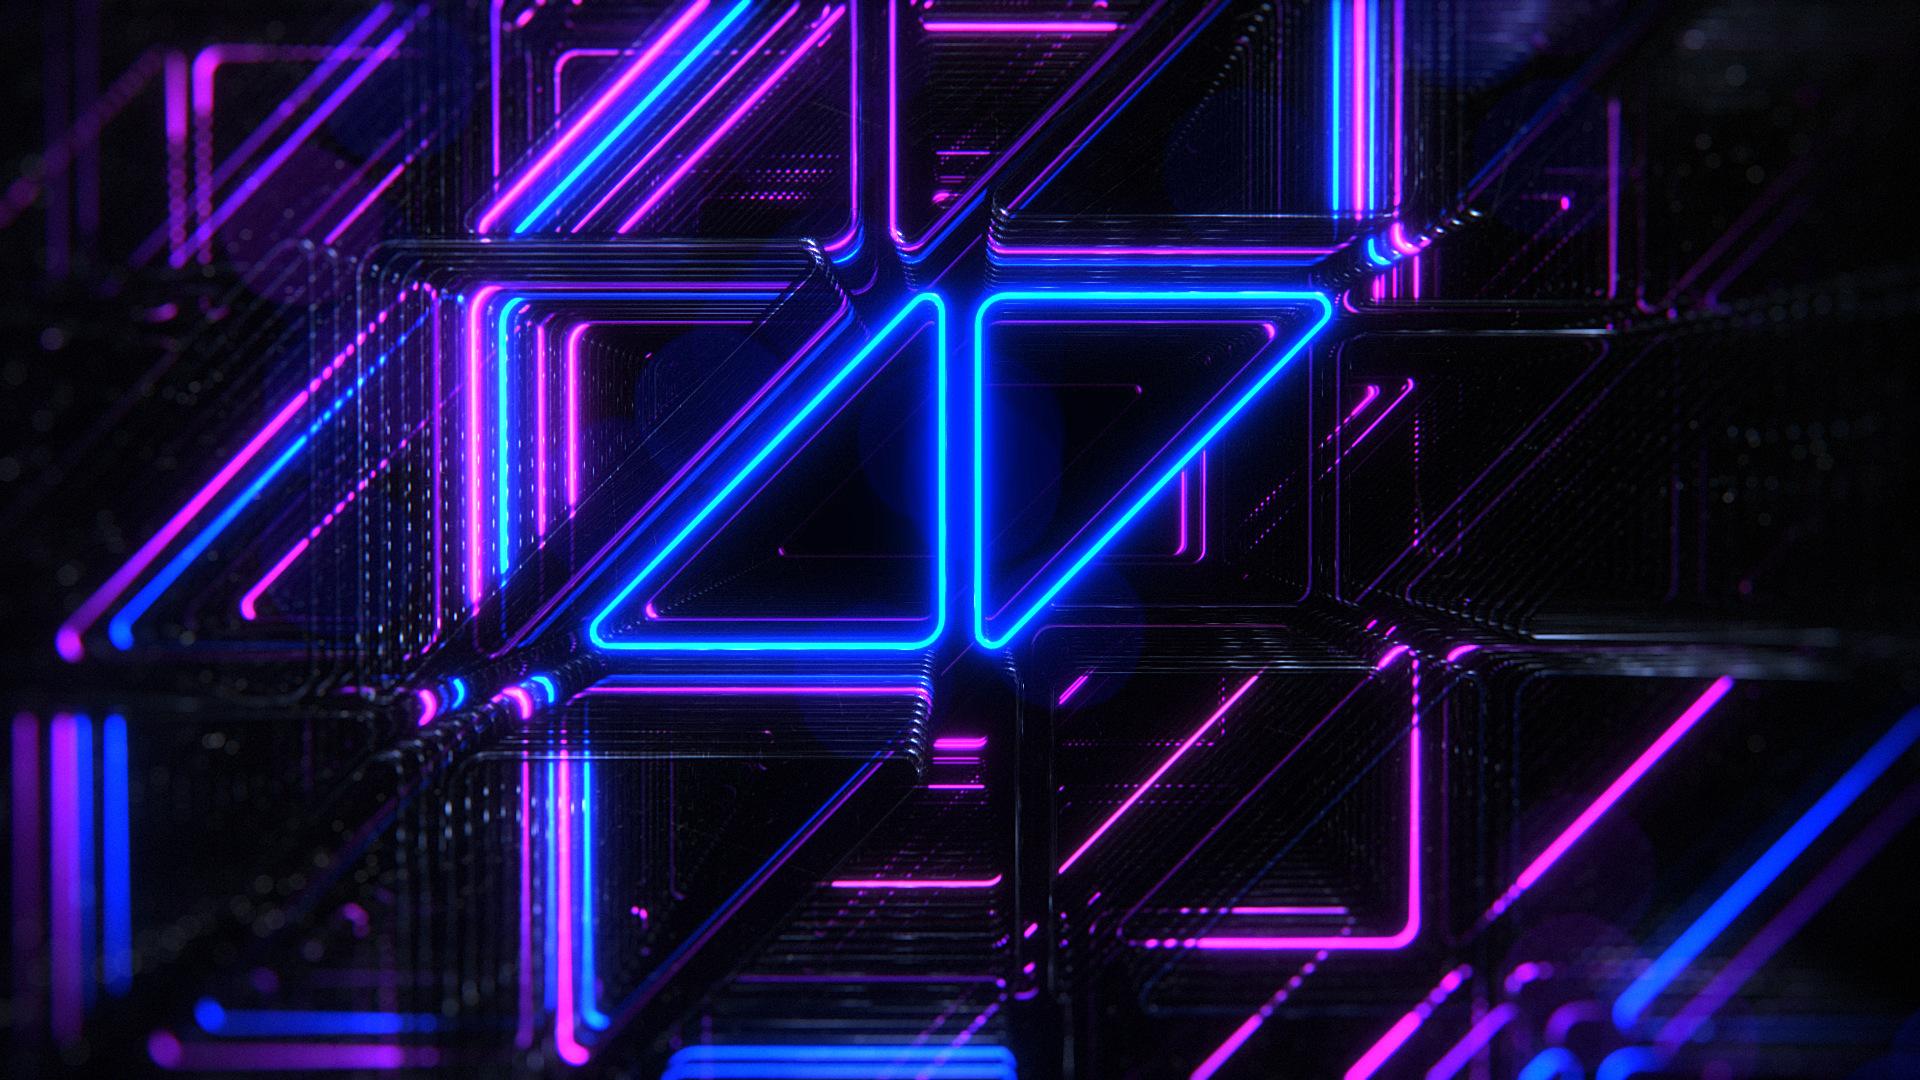 AVICII TATTOO 750X1334 | Mobile HD Wallpapers | Pinterest | Avicii ...